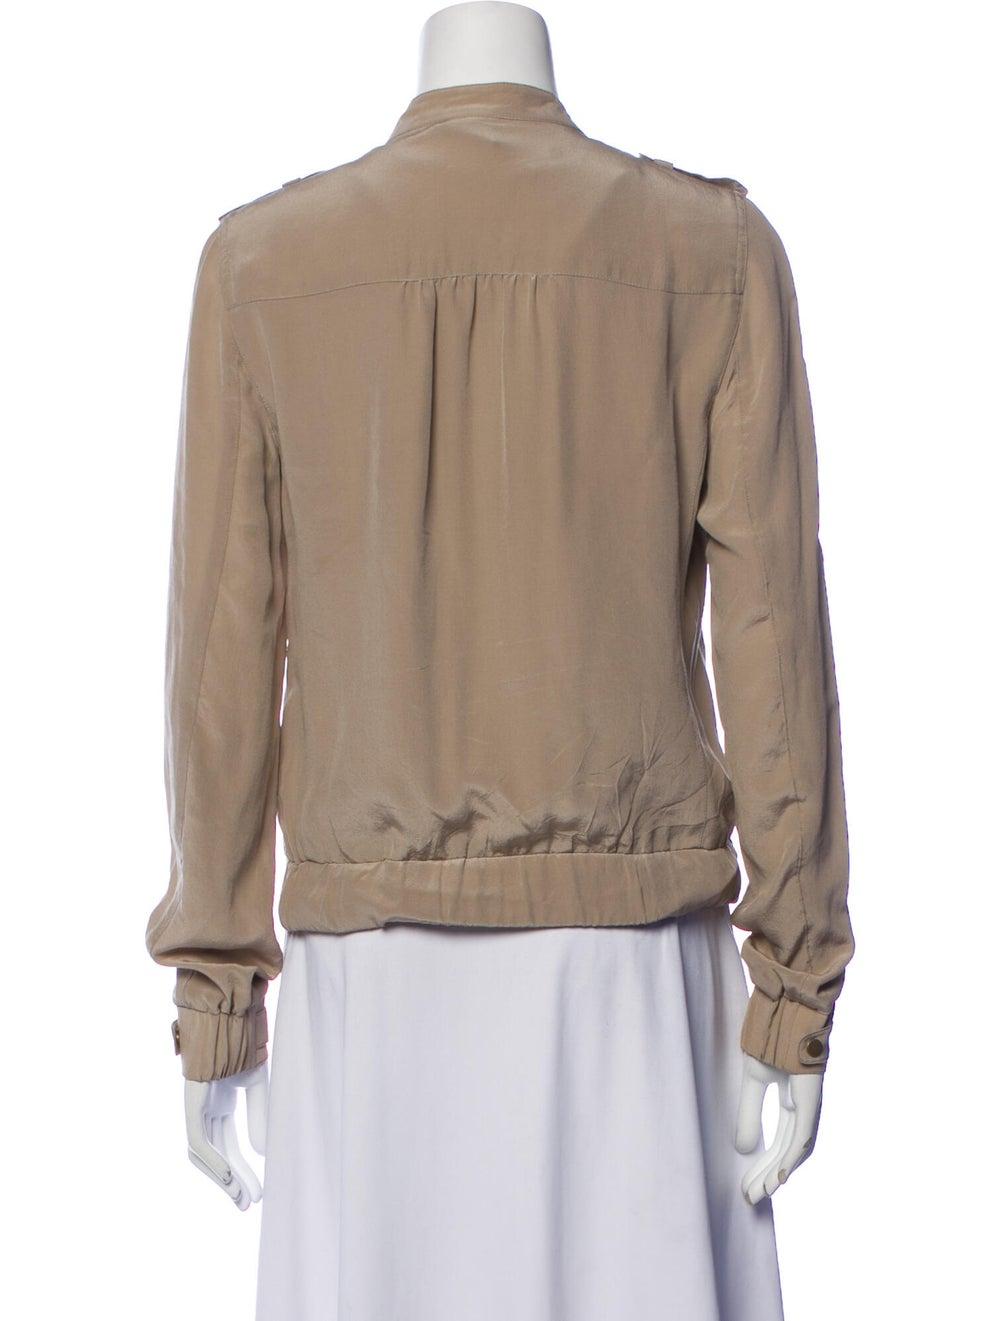 Edun Silk Bomber Jacket - image 3